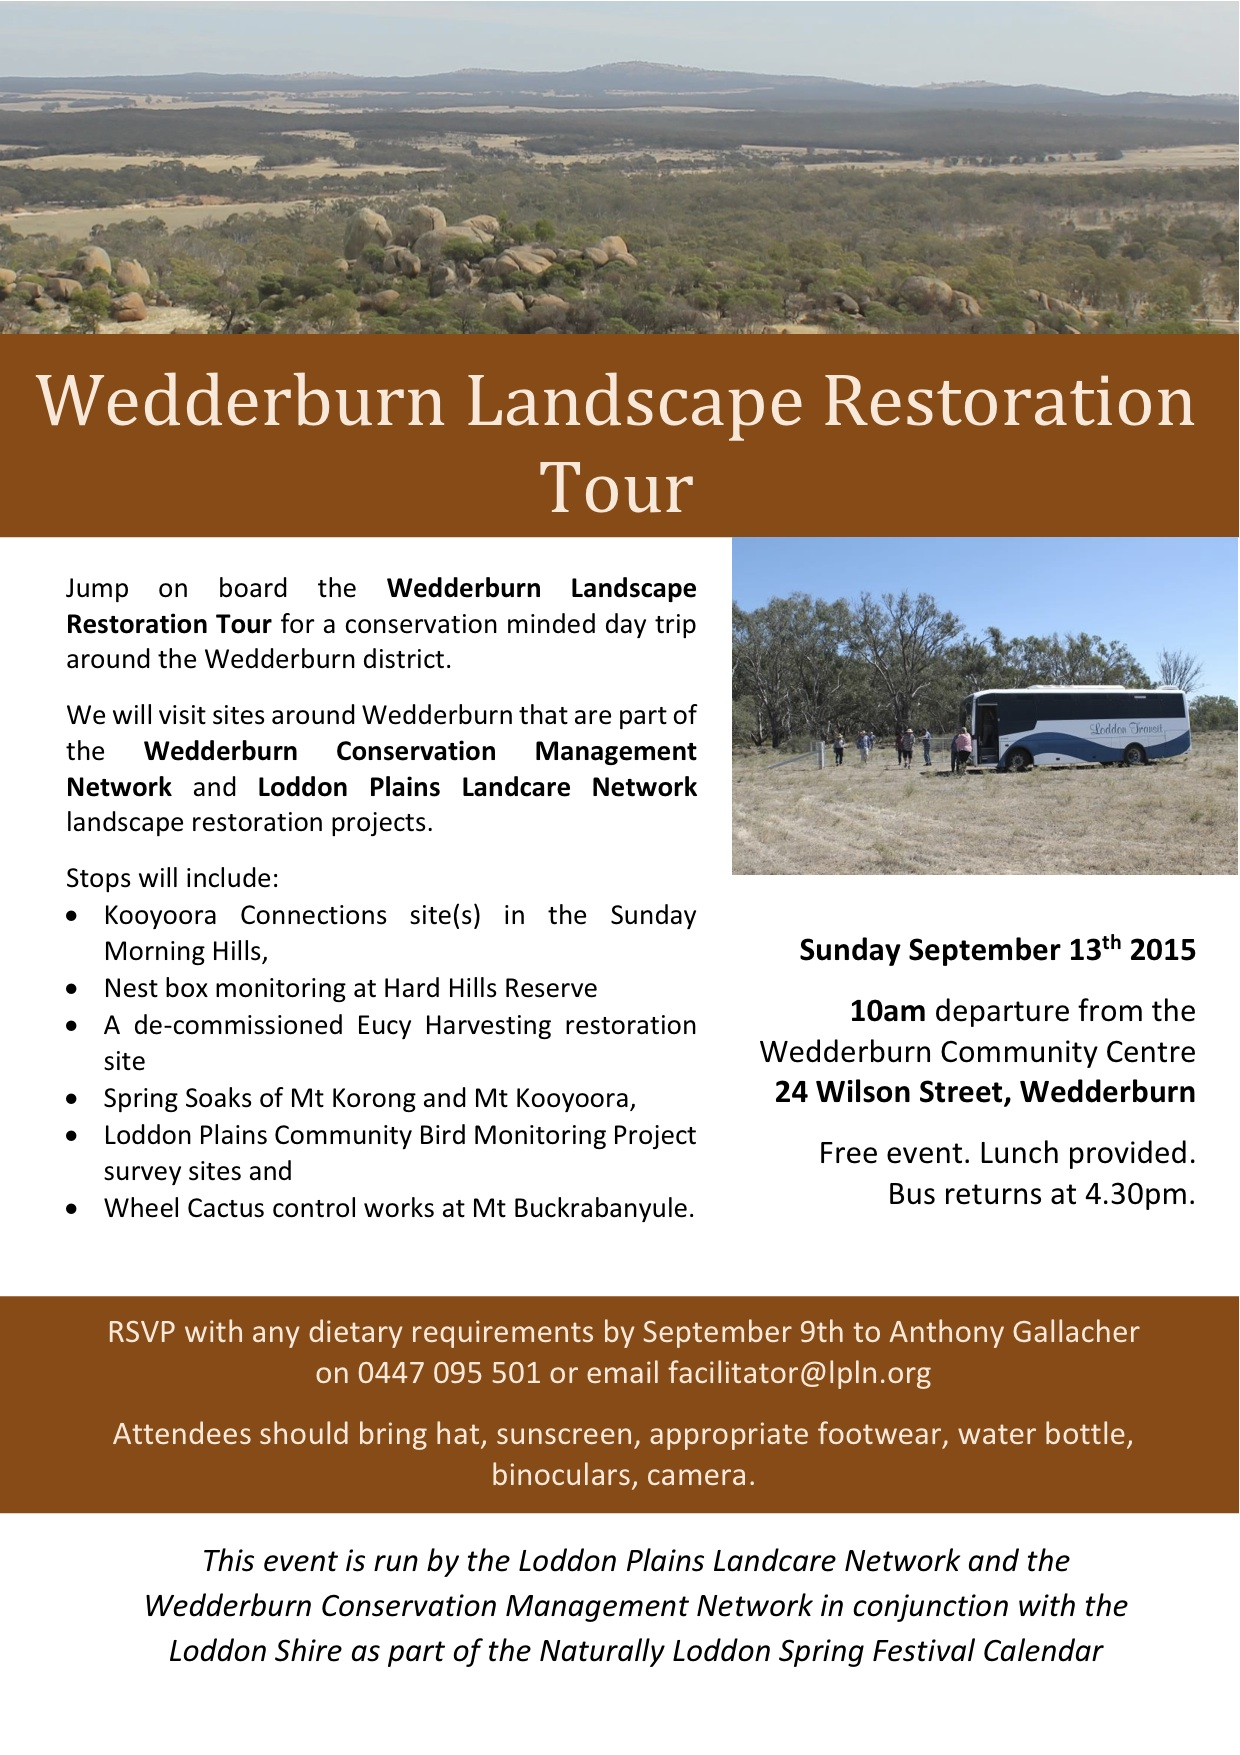 Wedderburn Landscape Restoration Tour flyer